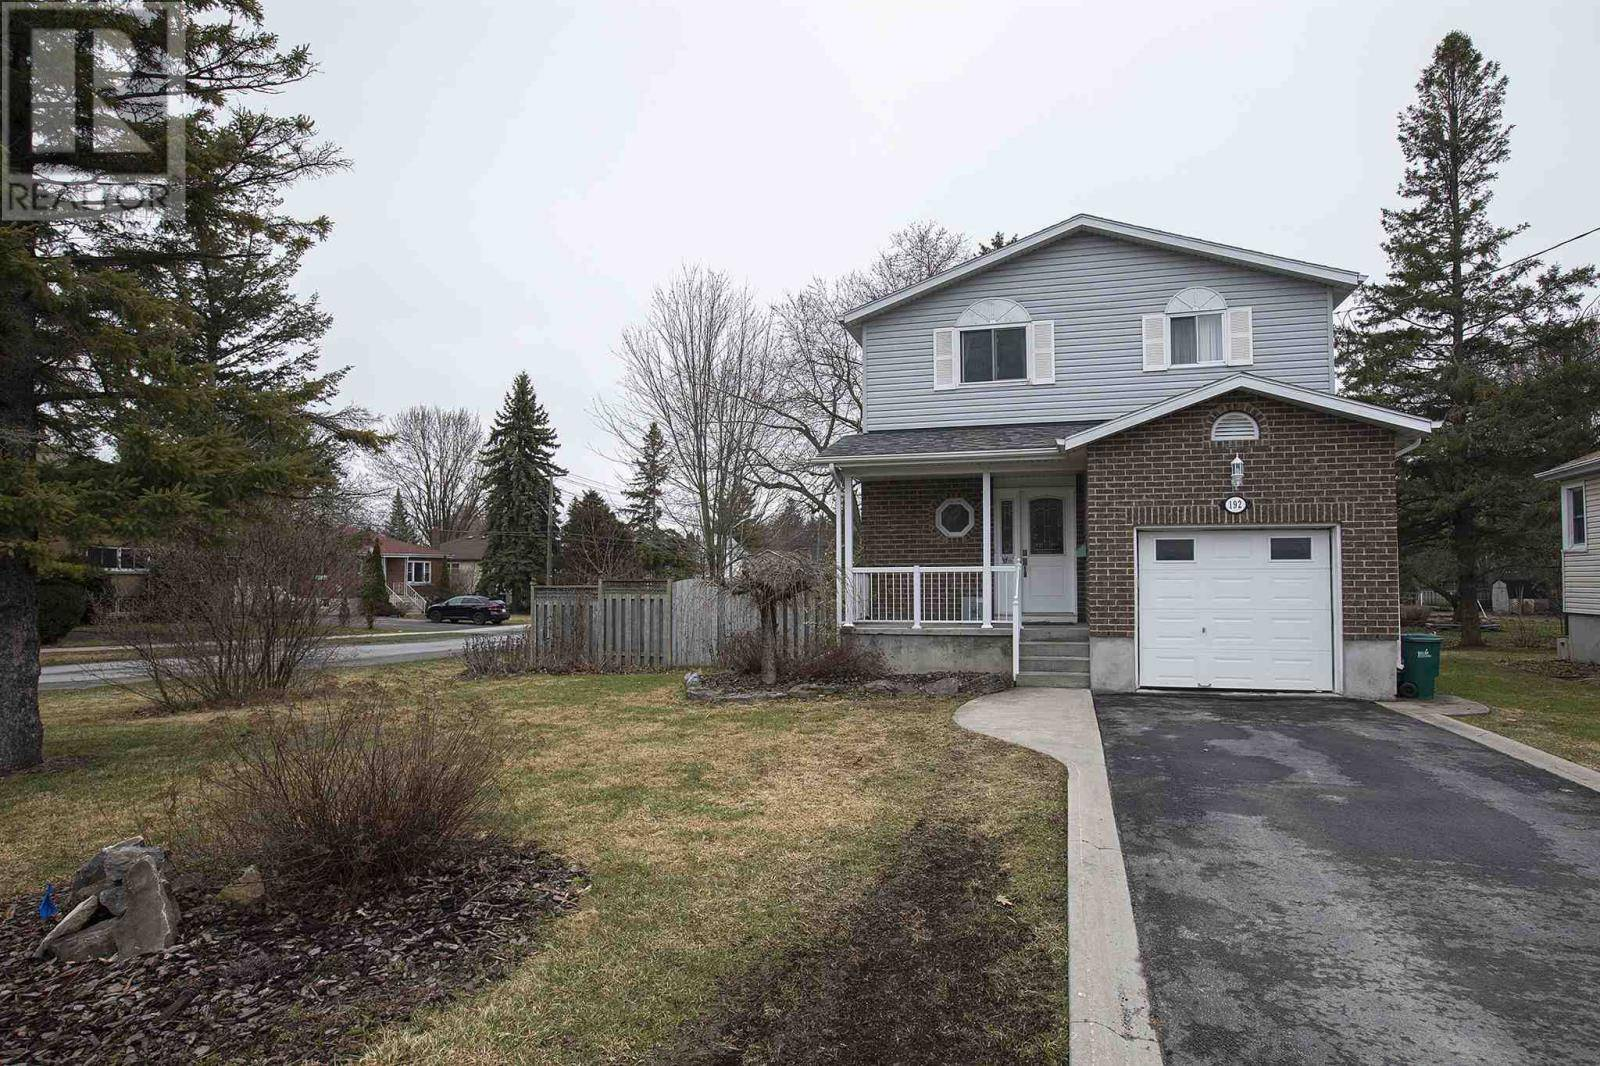 House for sale at 192 Fairview Rd Kingston Ontario - MLS: K20001765